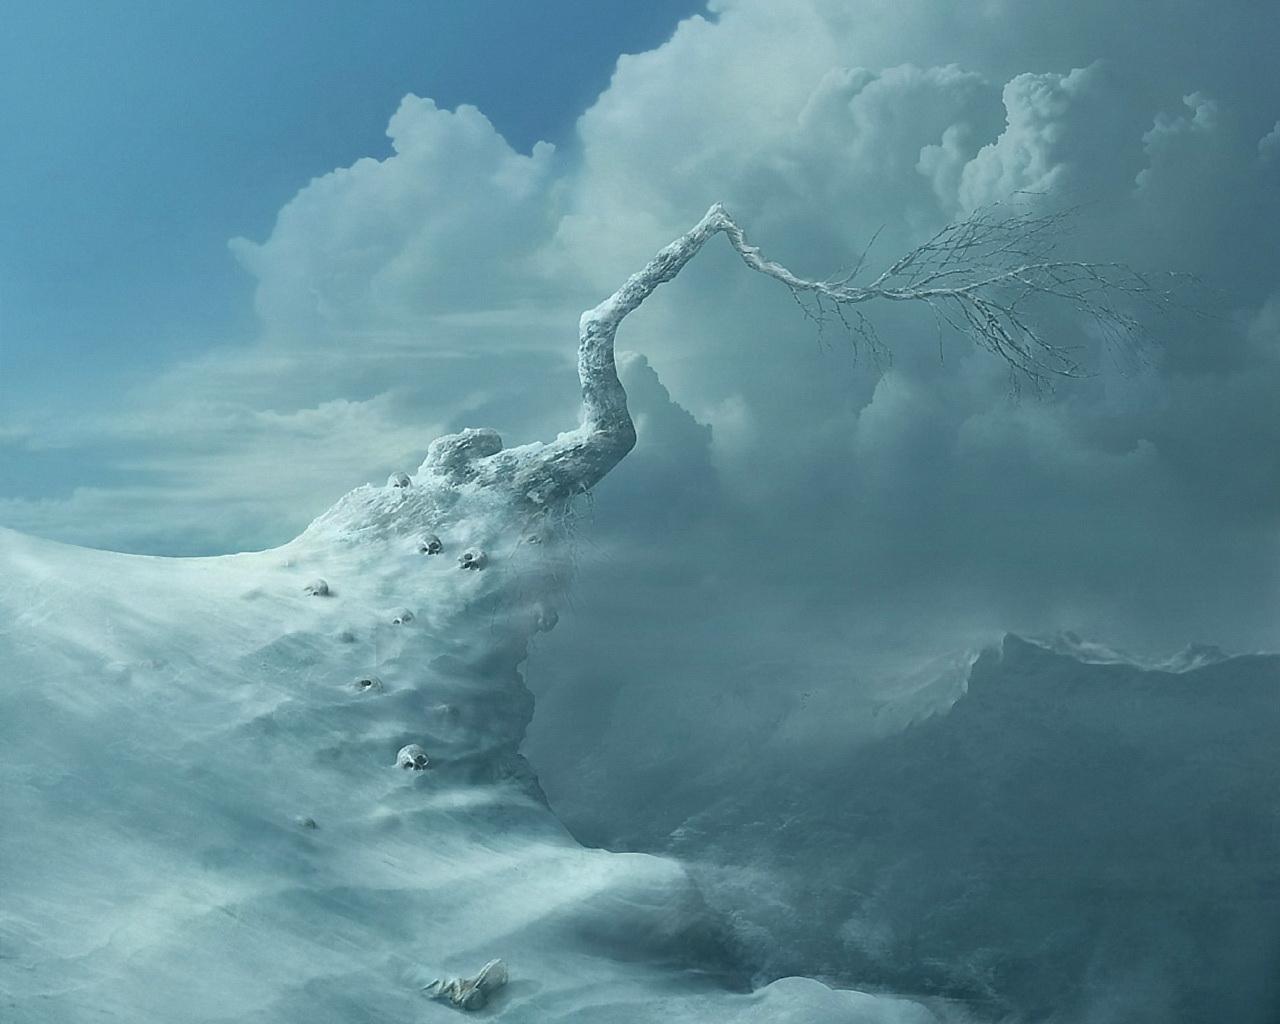 Fantasy Frozen Tree   1280x1024   54 1280x1024